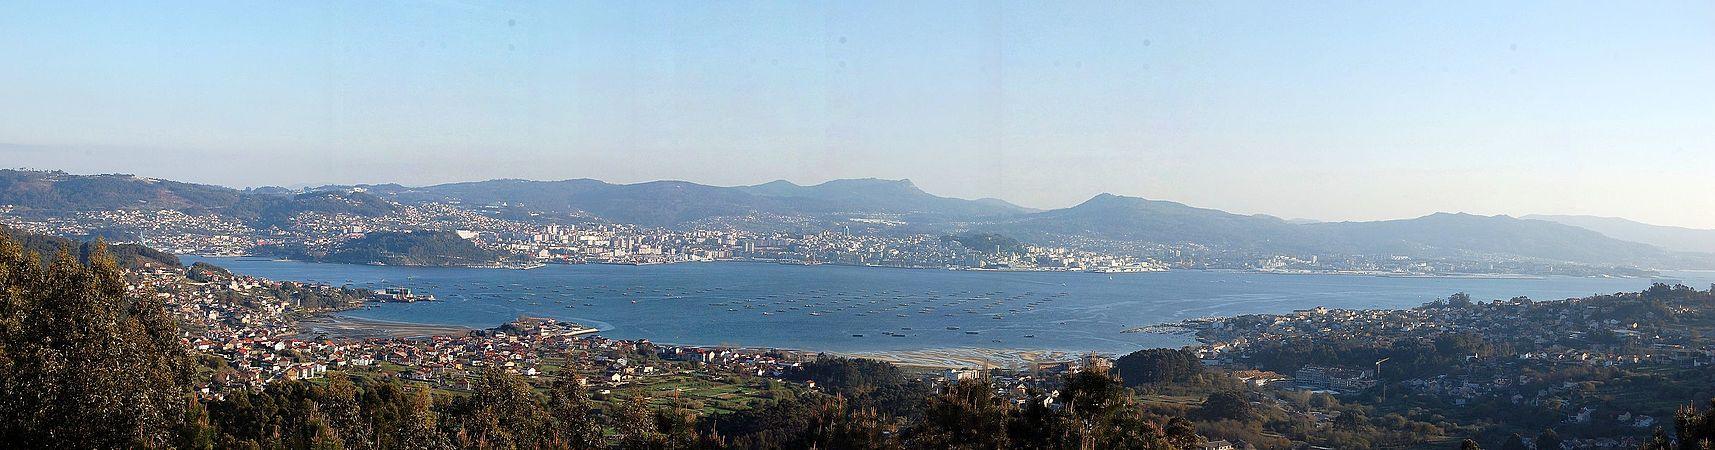 Vigo - Wikipedia, la enciclopedia libre